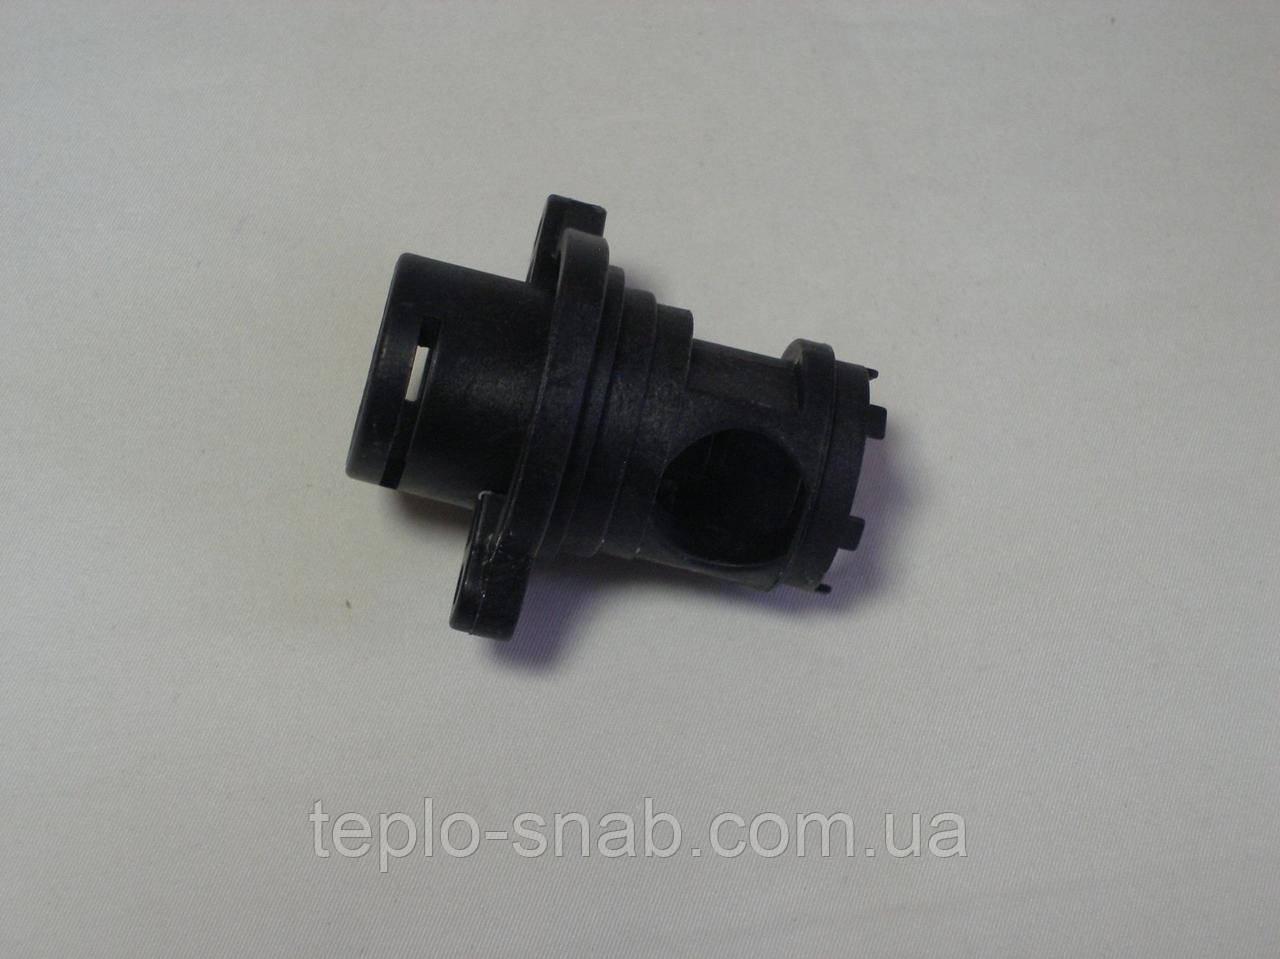 Крышка трехходового (Сальник 3-х ходового) Ariston Uno – 65100770